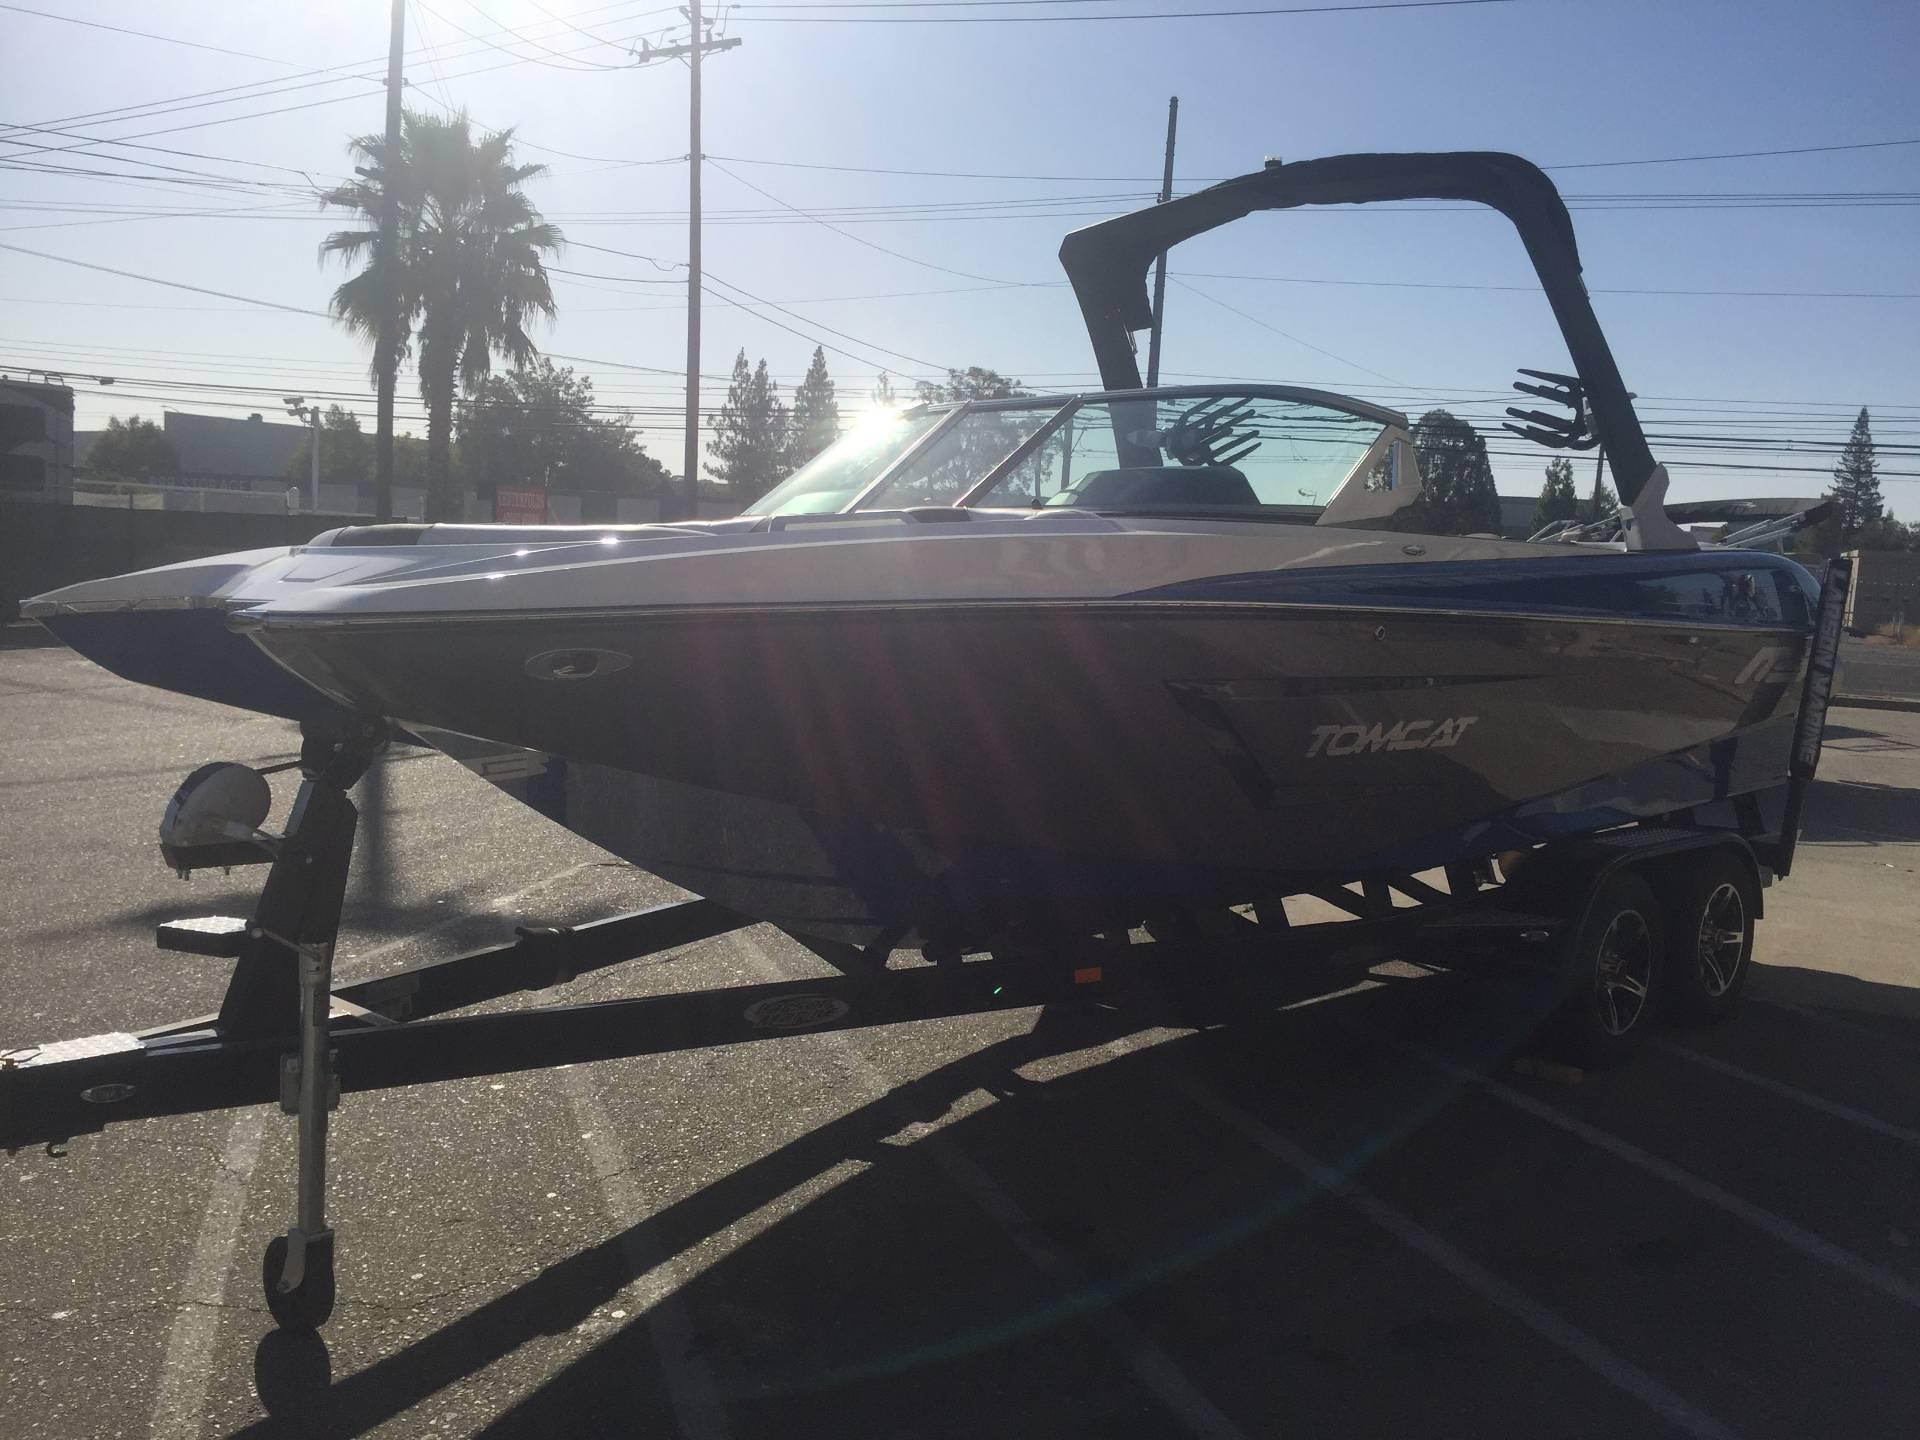 2017 MB F22 Tomcat in Rancho Cordova, California